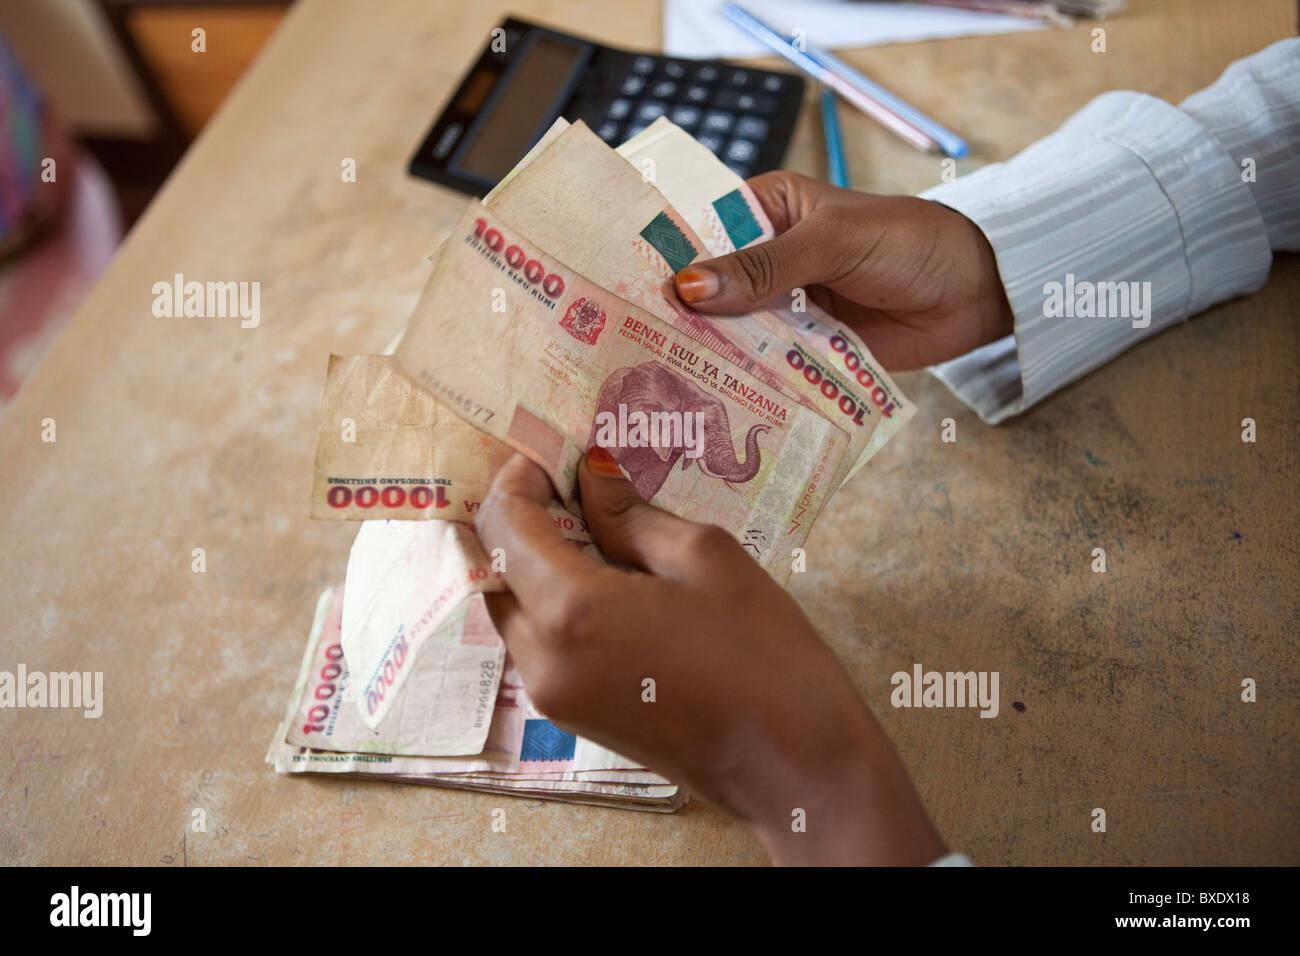 An accountant counts cash (Tanzanian Shillings) in Dodoma, Tanzania, East Africa. - Stock Image